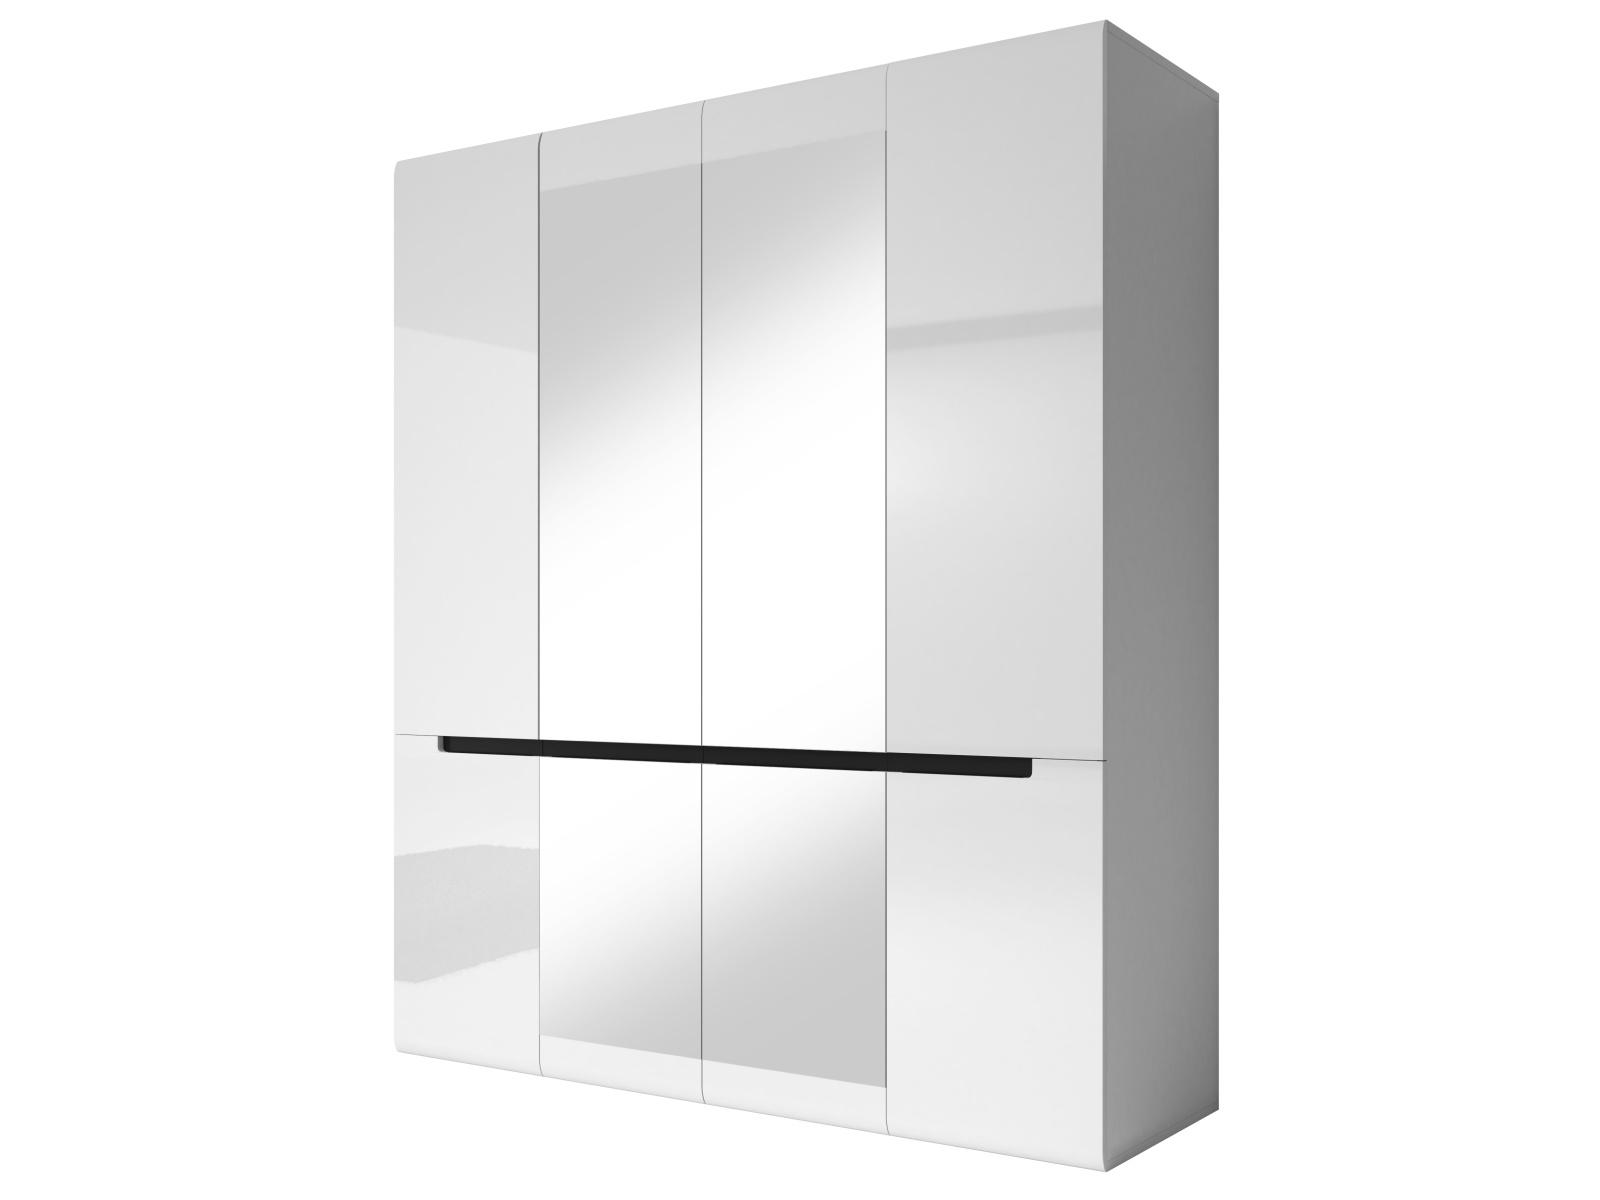 Smartshop HEKTOR šatní skříň se zrcadlem 180 TYP 20, bílá/bílý lesk